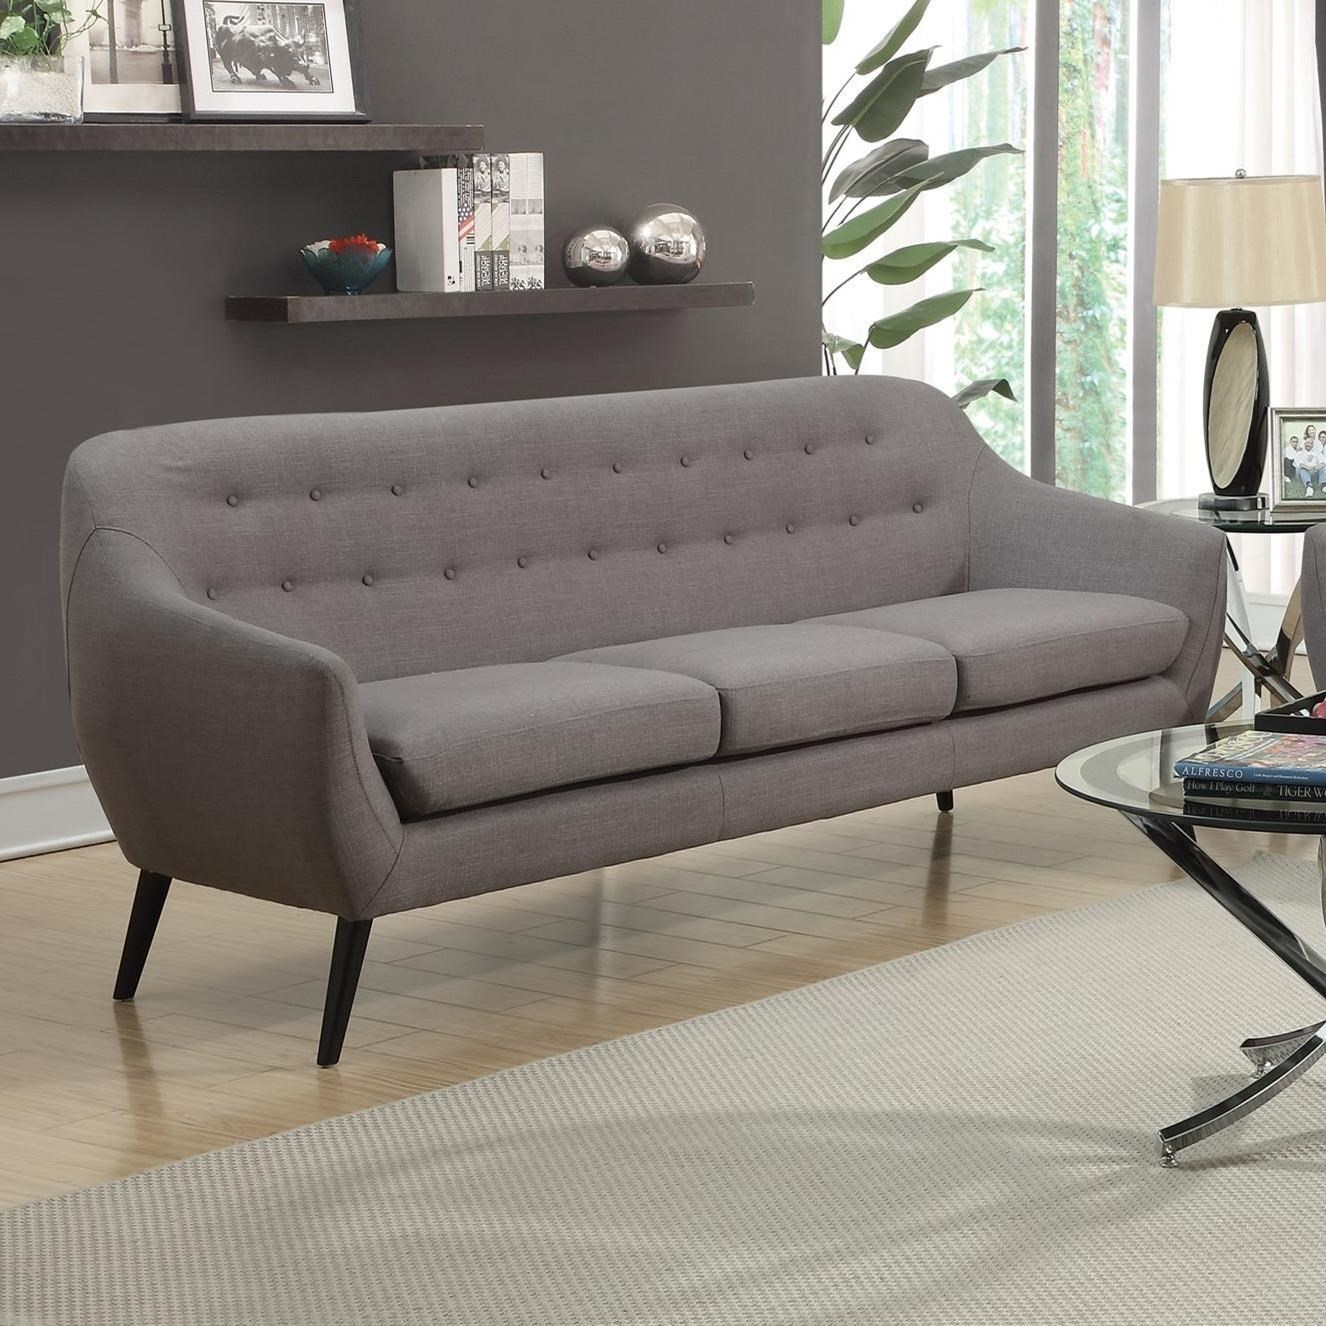 century furniture sofa quality gray sectional with nailhead trim dawson mid modern at